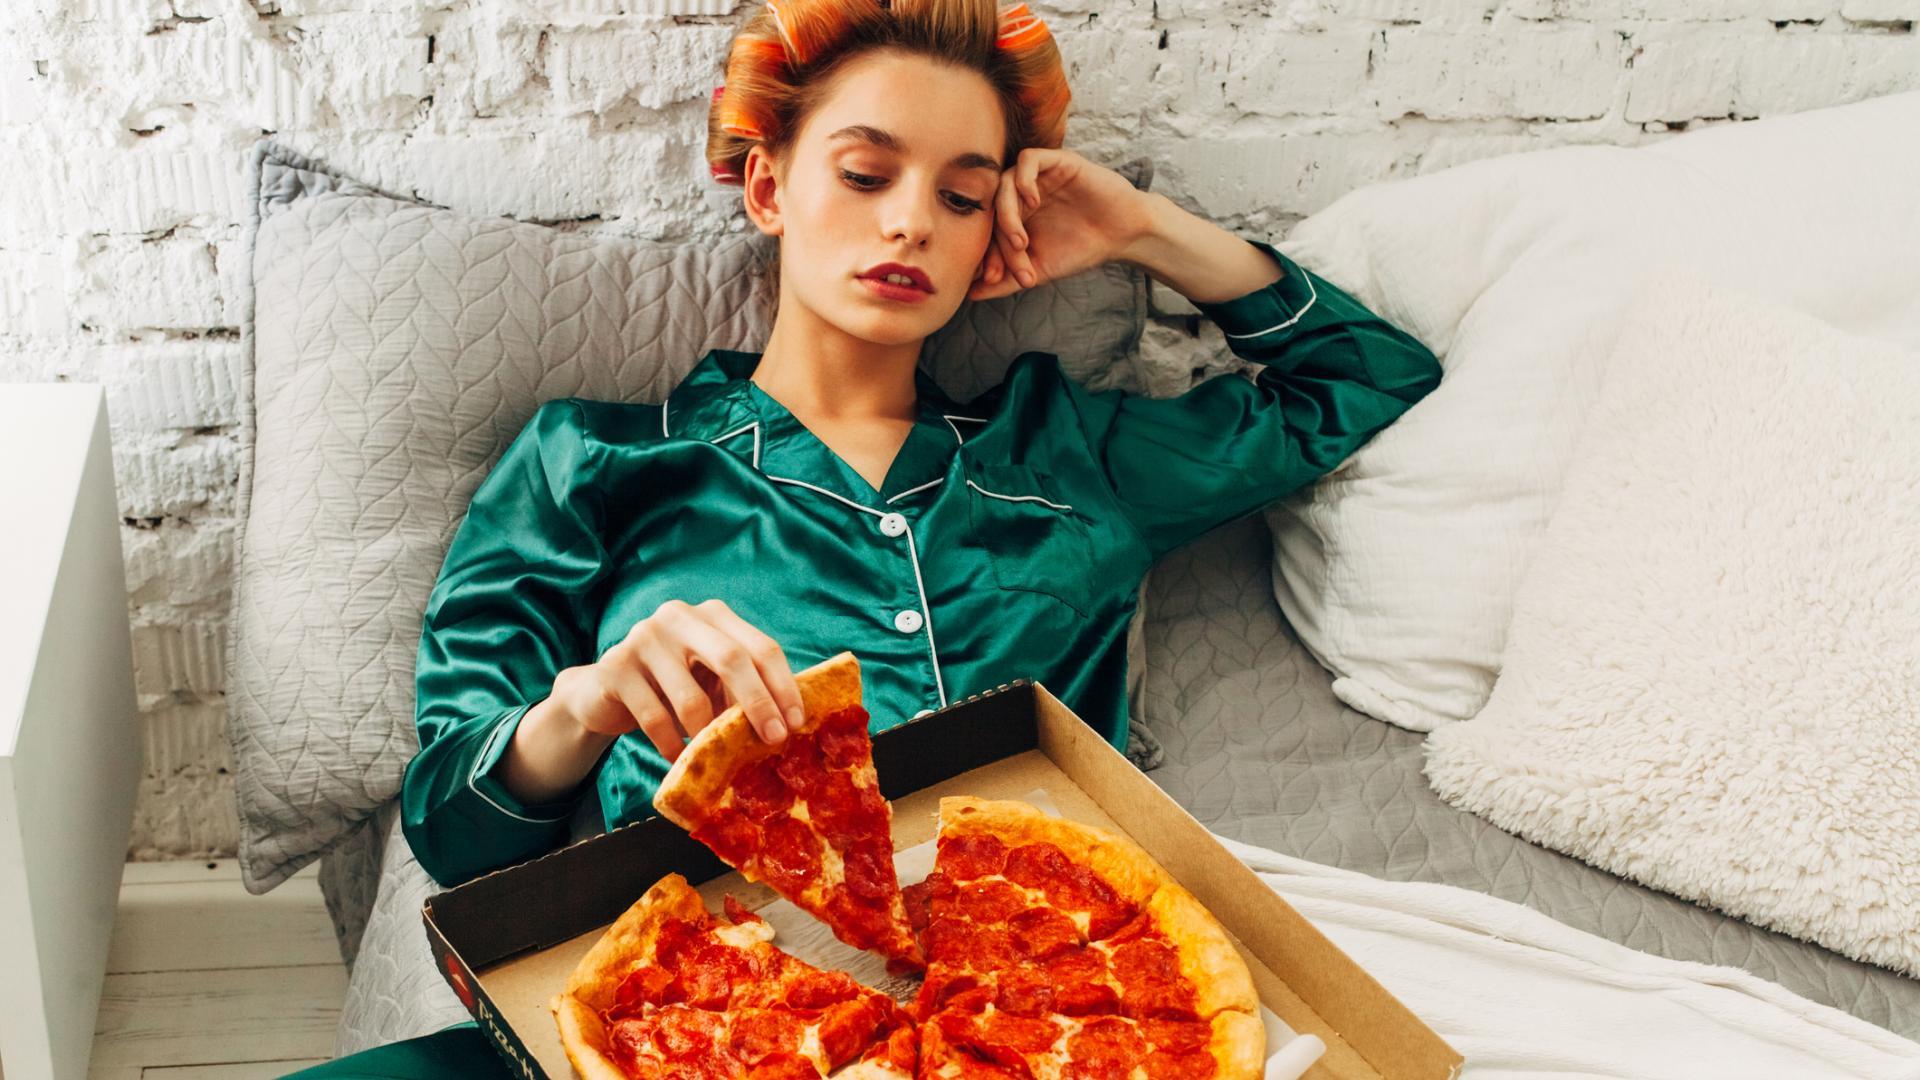 Frau & Pizza